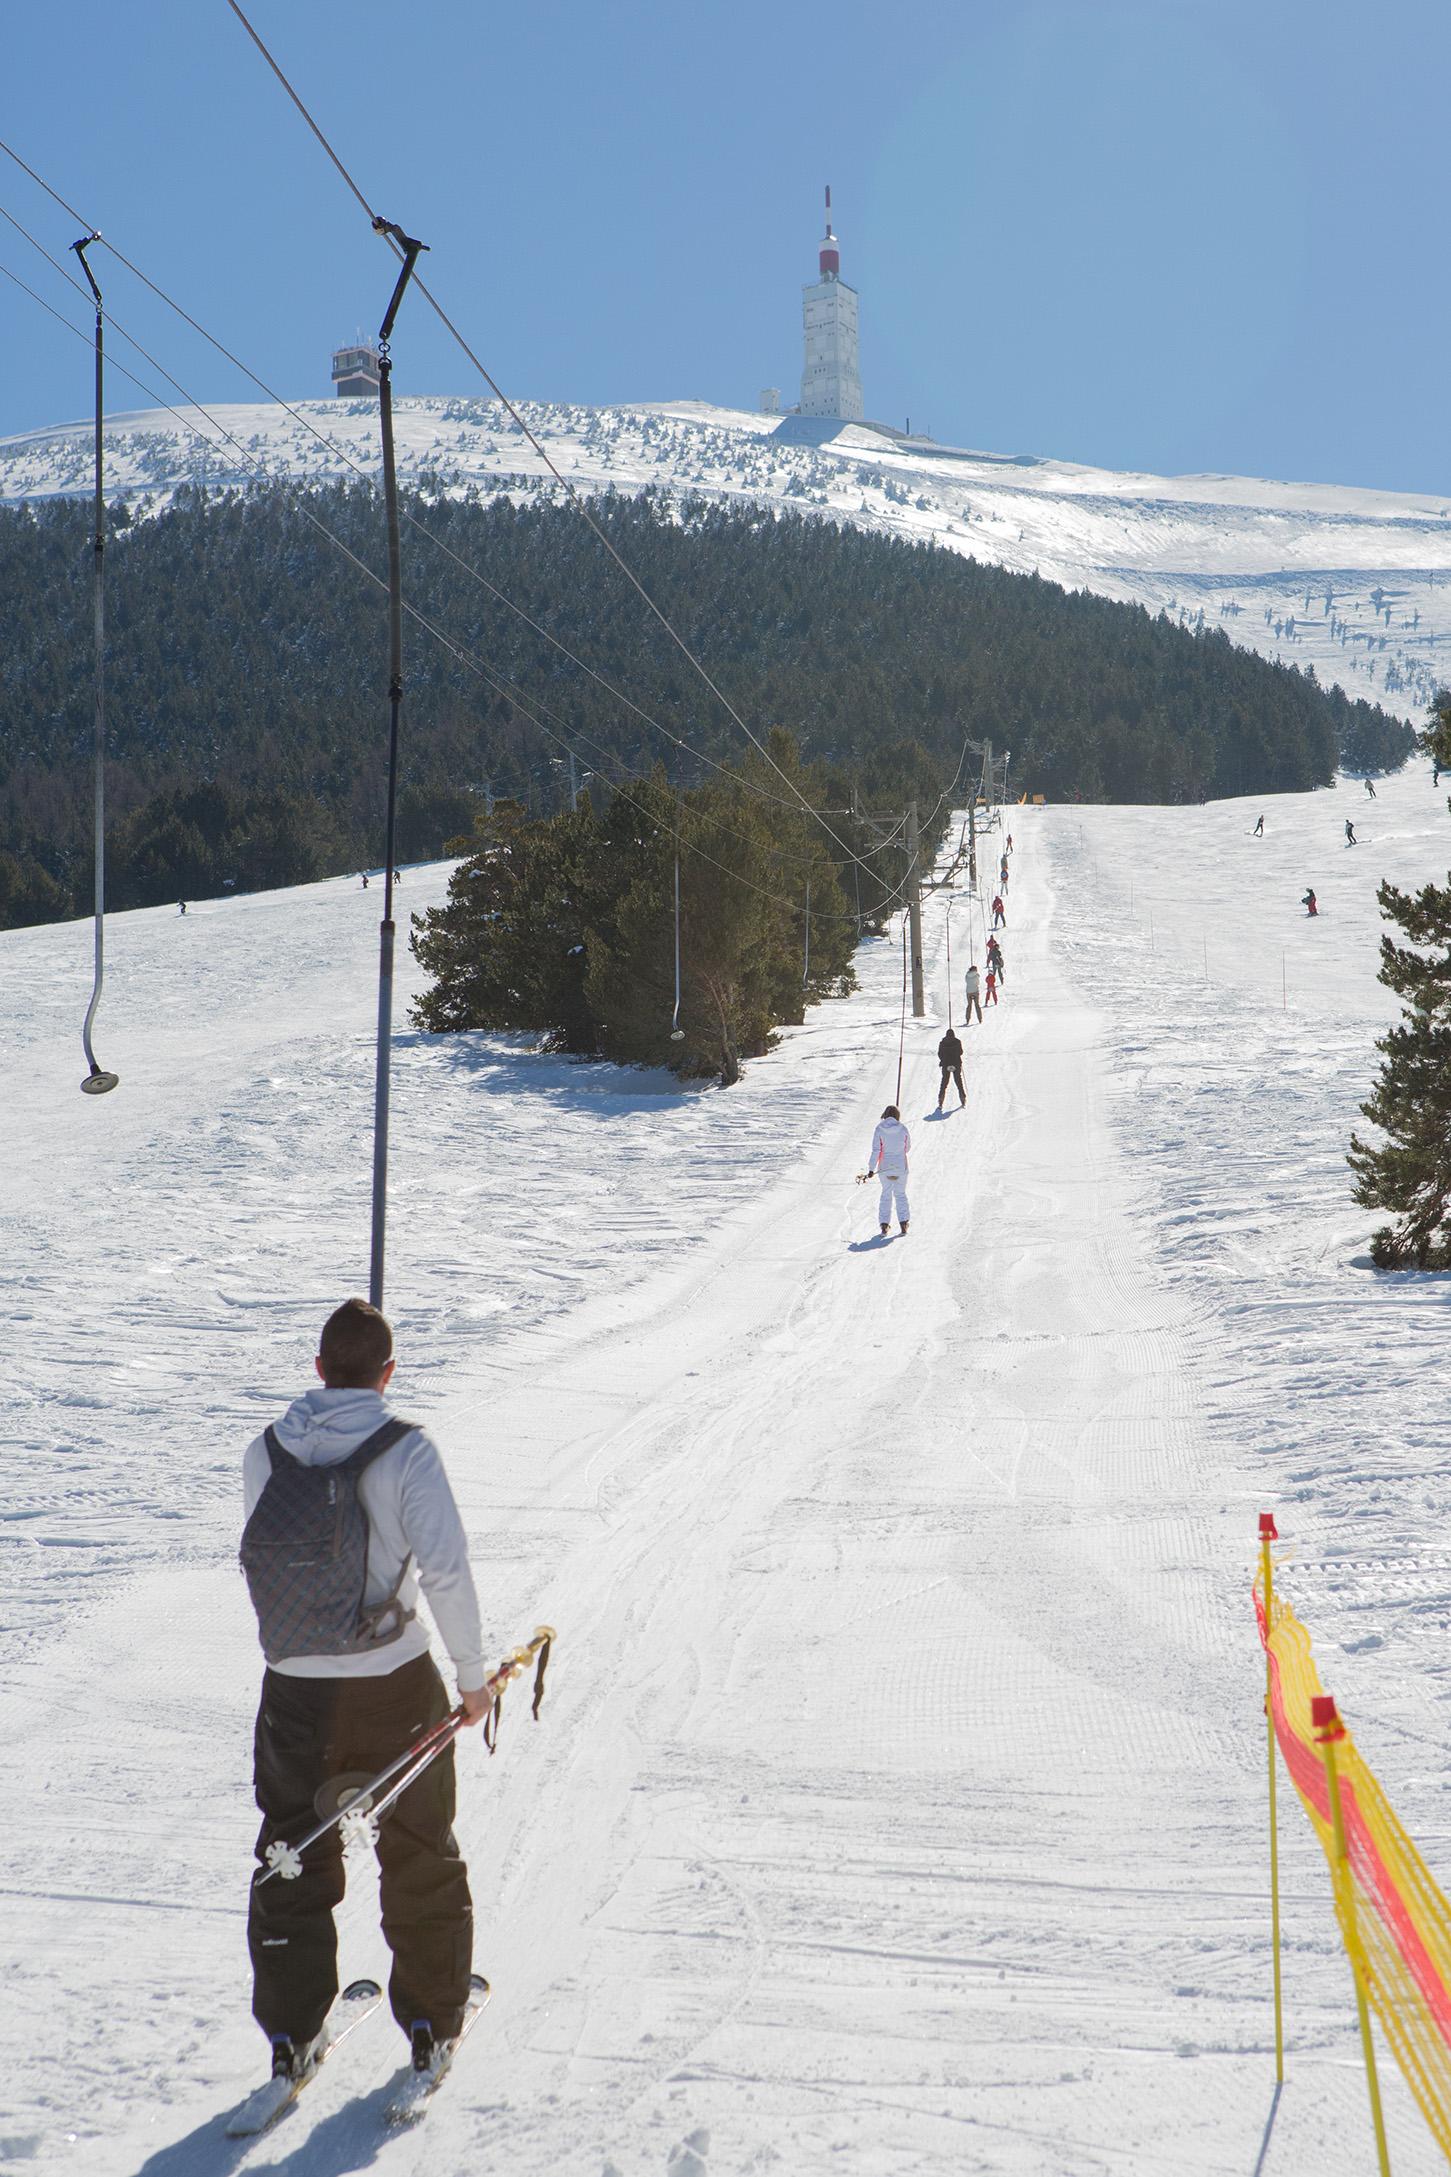 station de ski du mont ventoux au mont serein. Black Bedroom Furniture Sets. Home Design Ideas